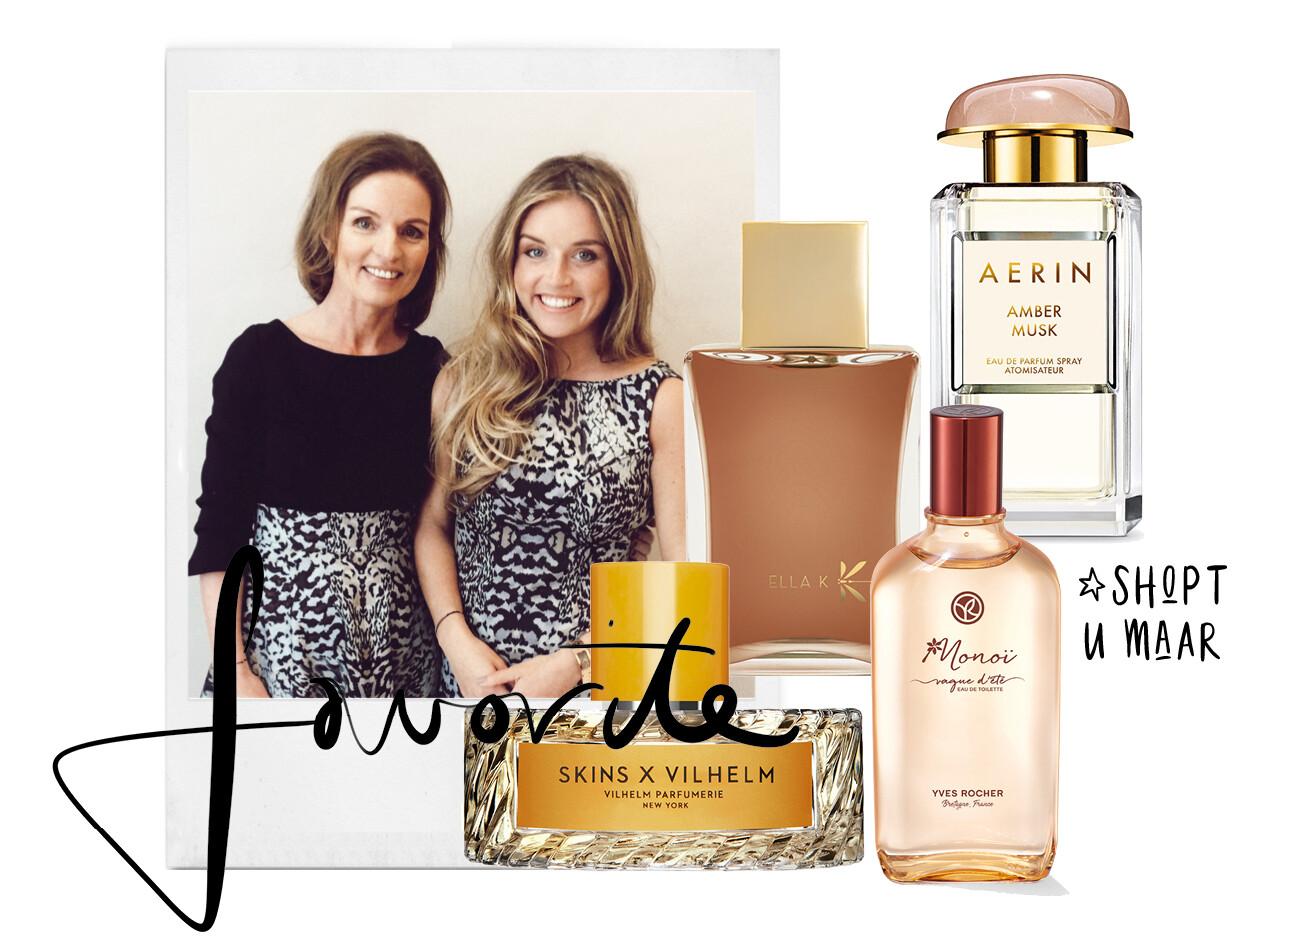 Lotte en moeder parfum flacons shopping